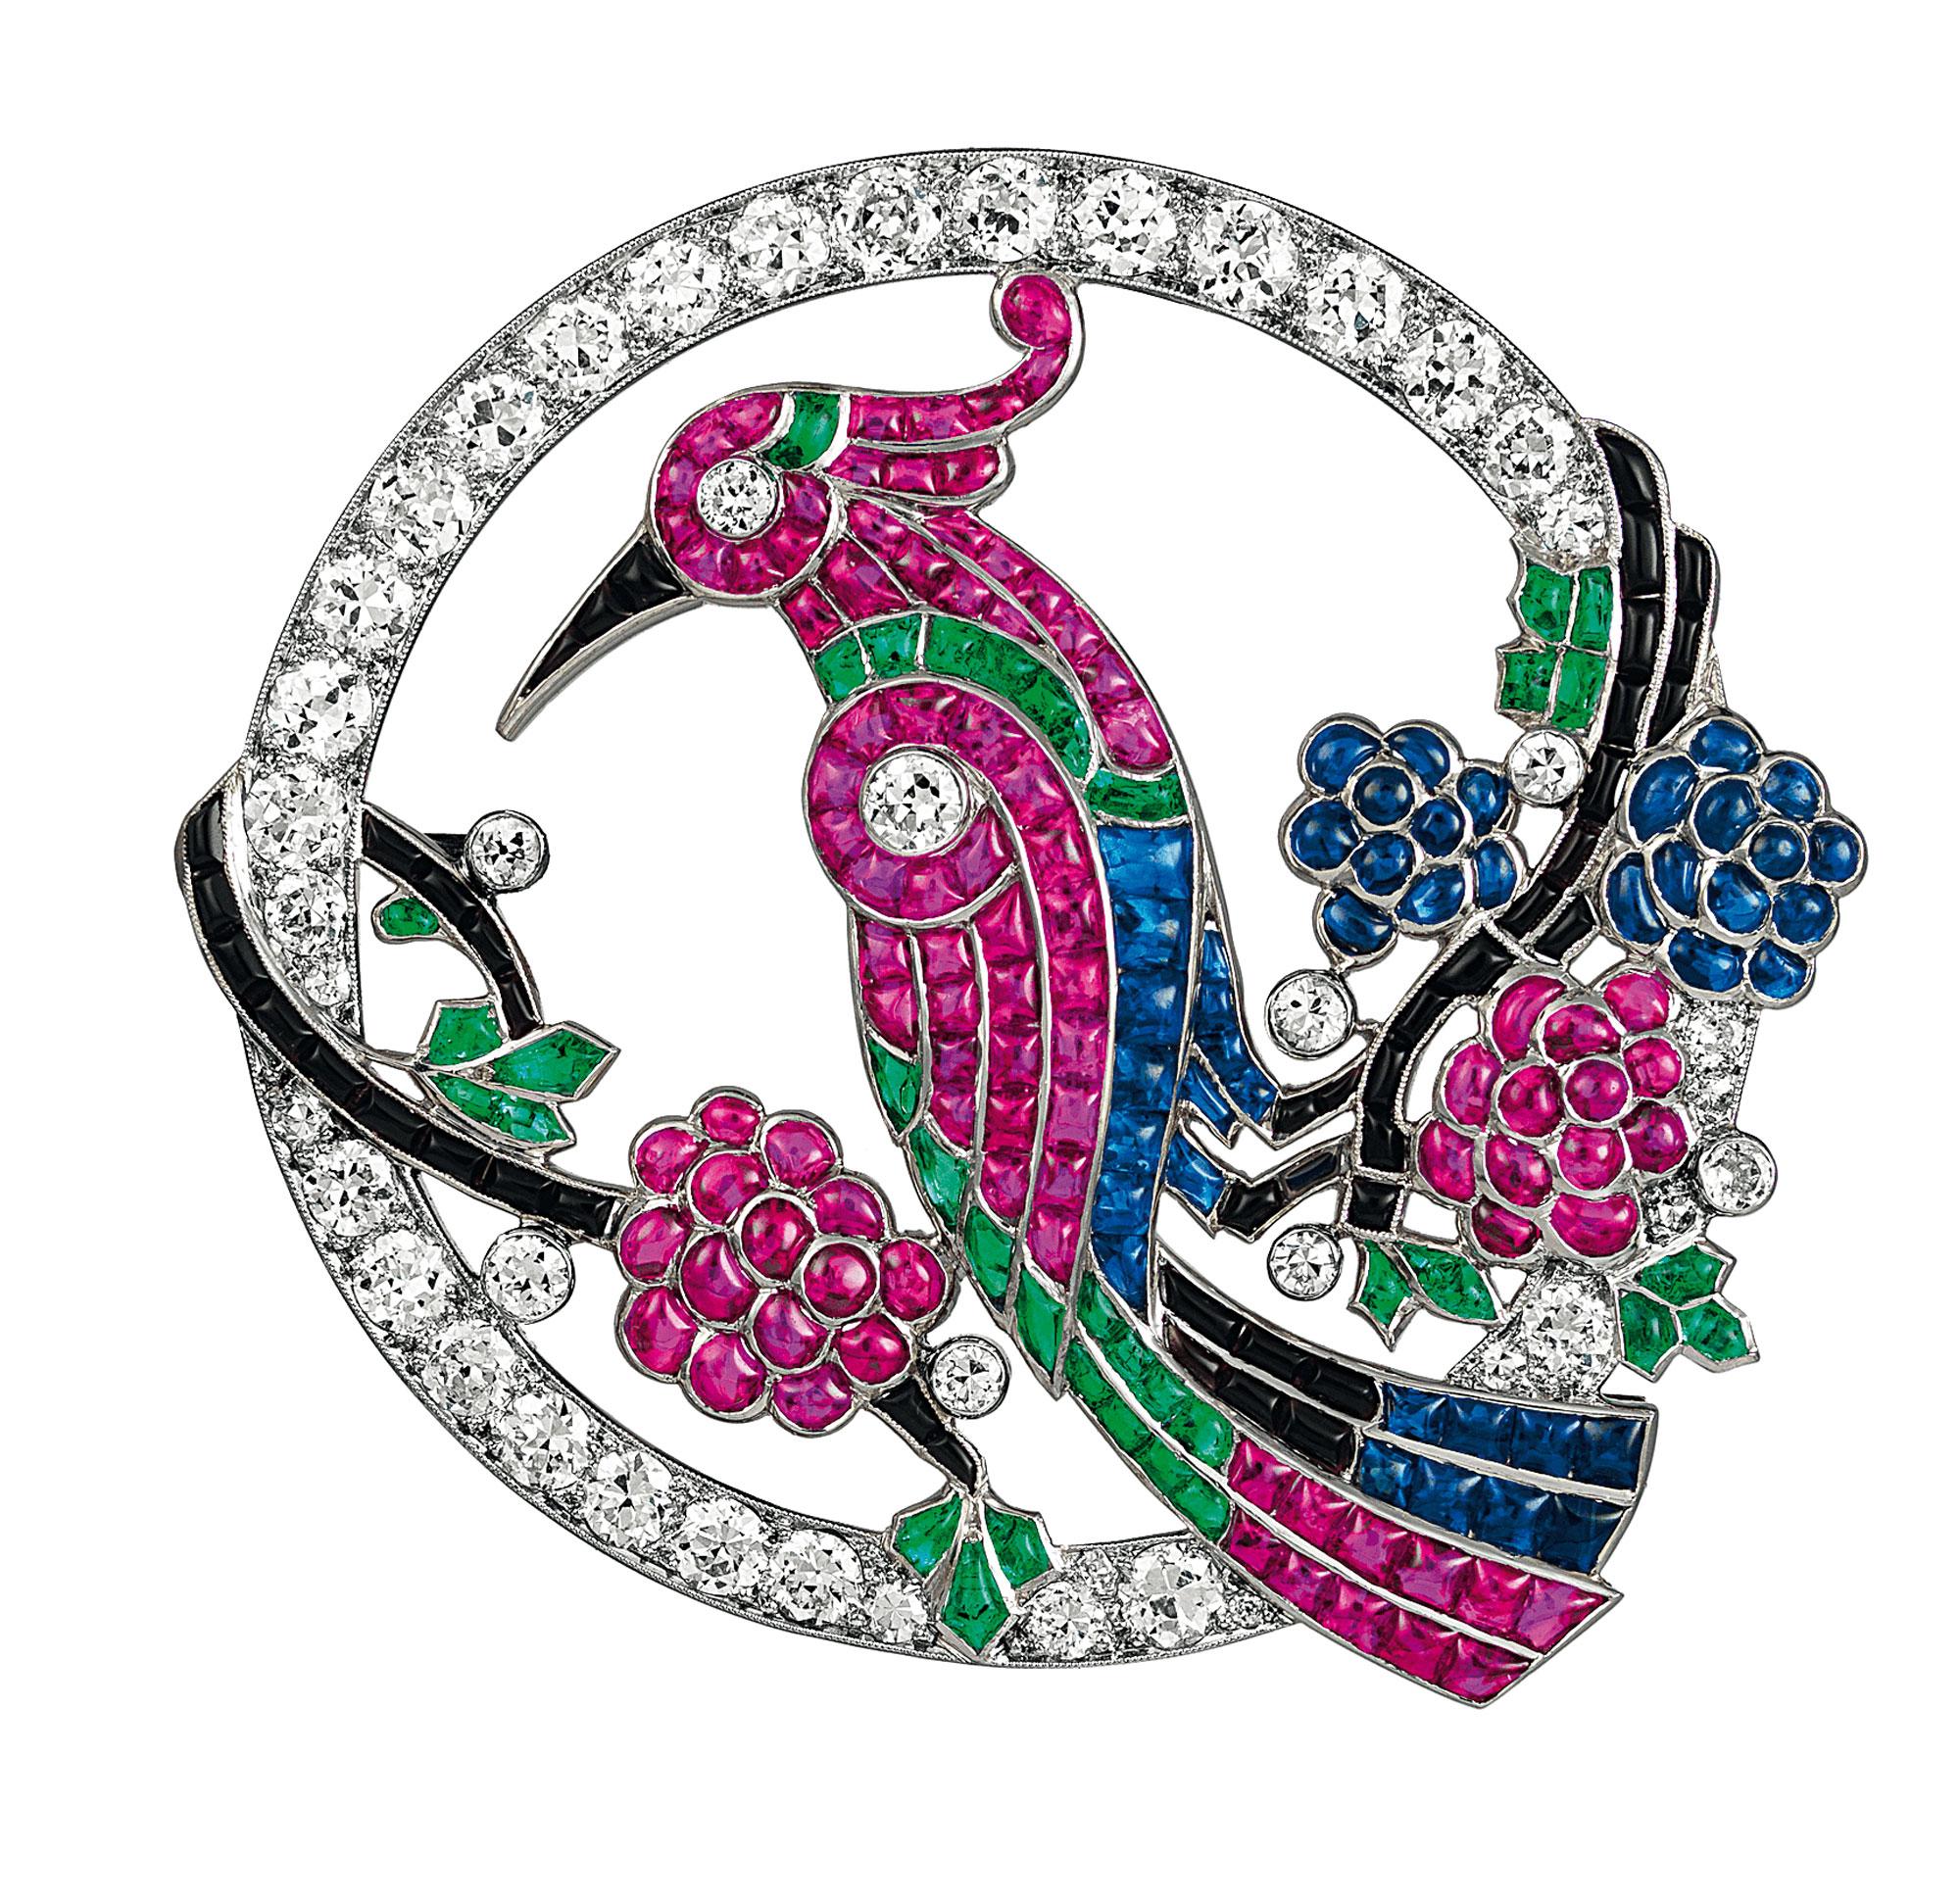 Bird brooch, 1924, Platinum, emeralds, sapphires, rubies, onyx, diamonds Van Cleef & Arpels Collection – Photo Credit: Van Cleef & Arpels